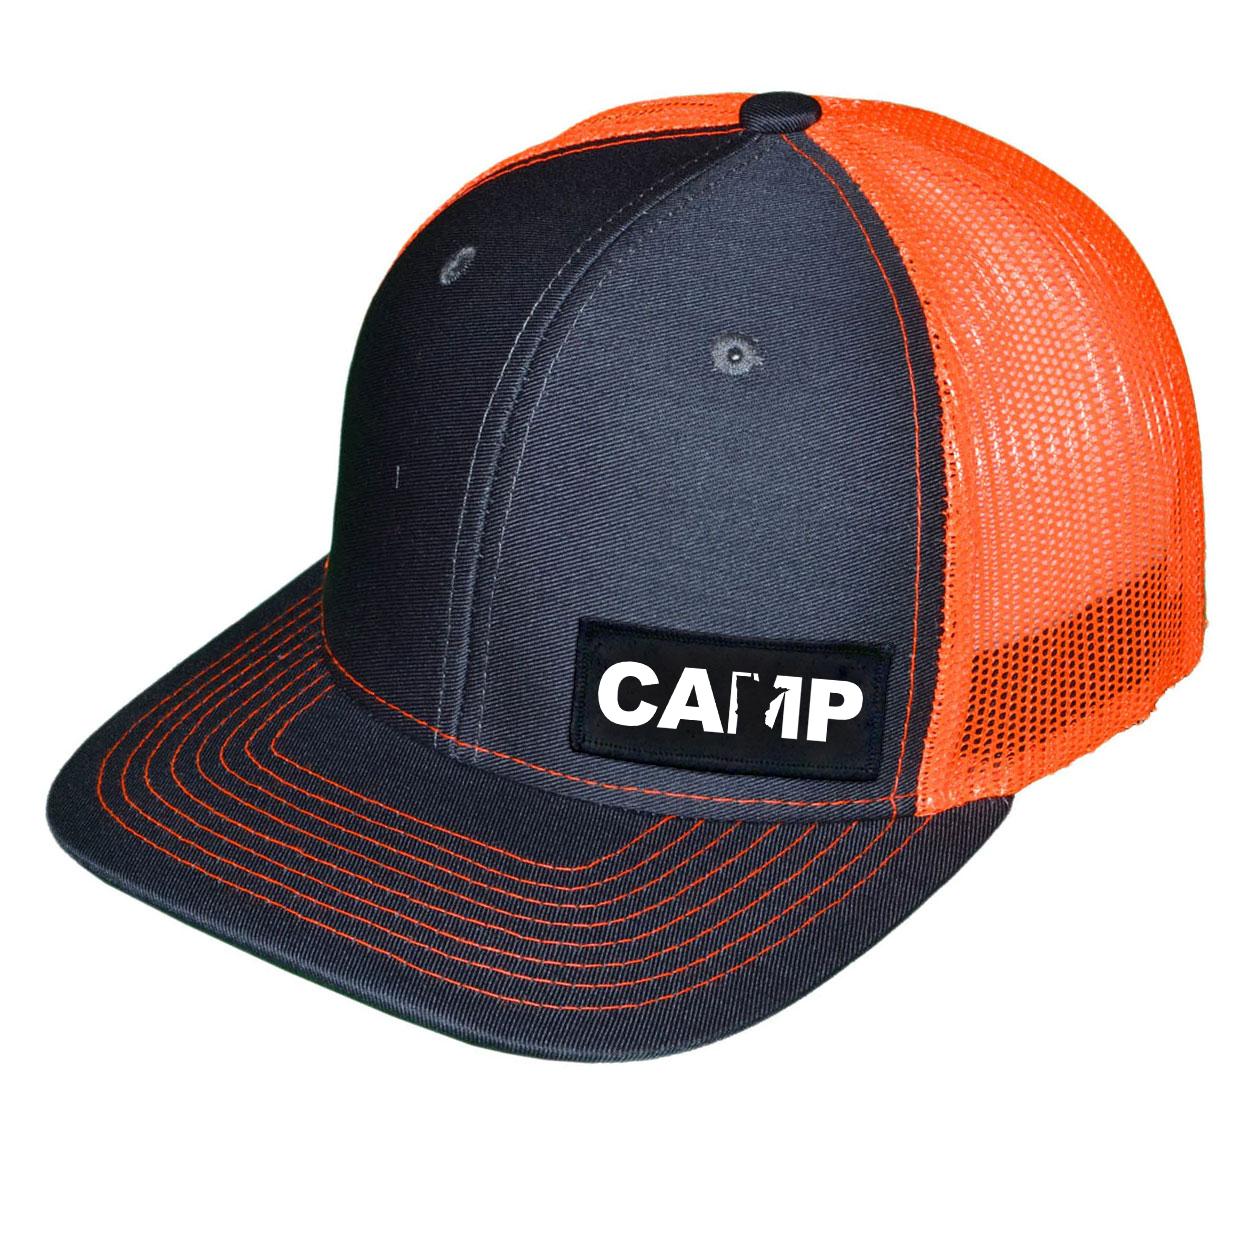 Camp Minnesota Night Out Woven Patch Snapback Trucker Hat Dark Gray/Orange (White Logo)